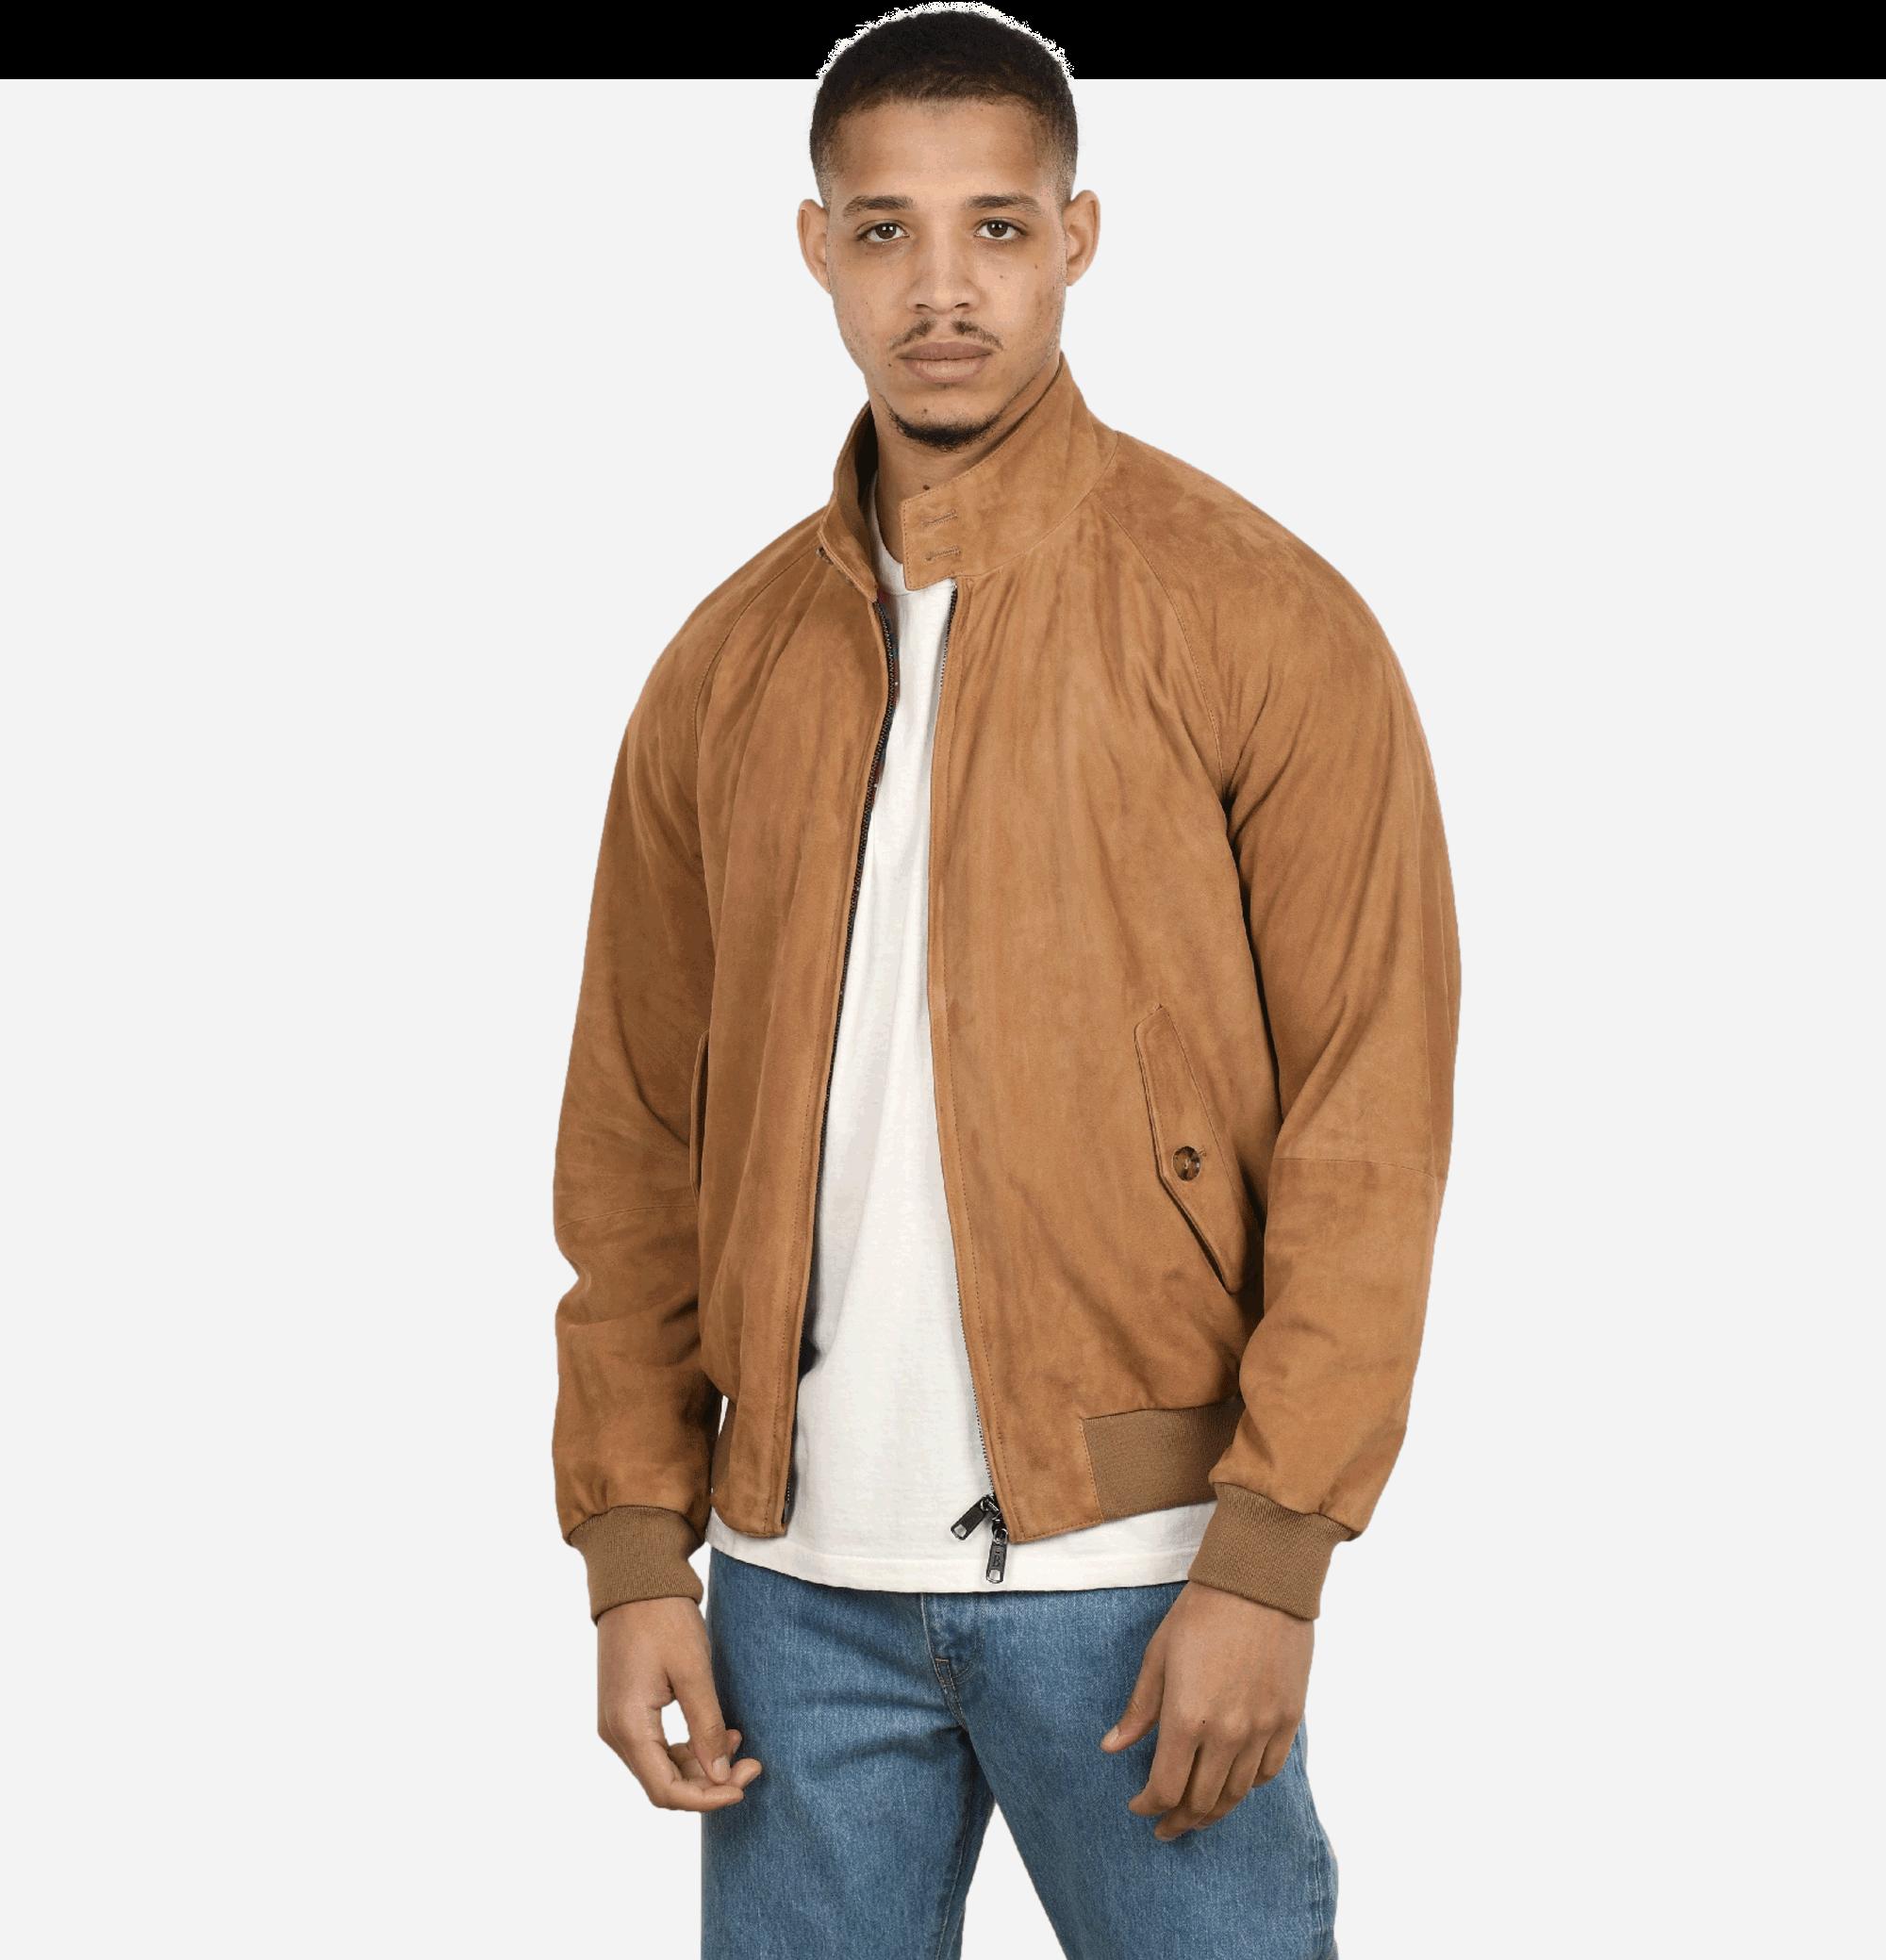 G9 Jacket Suede Tan